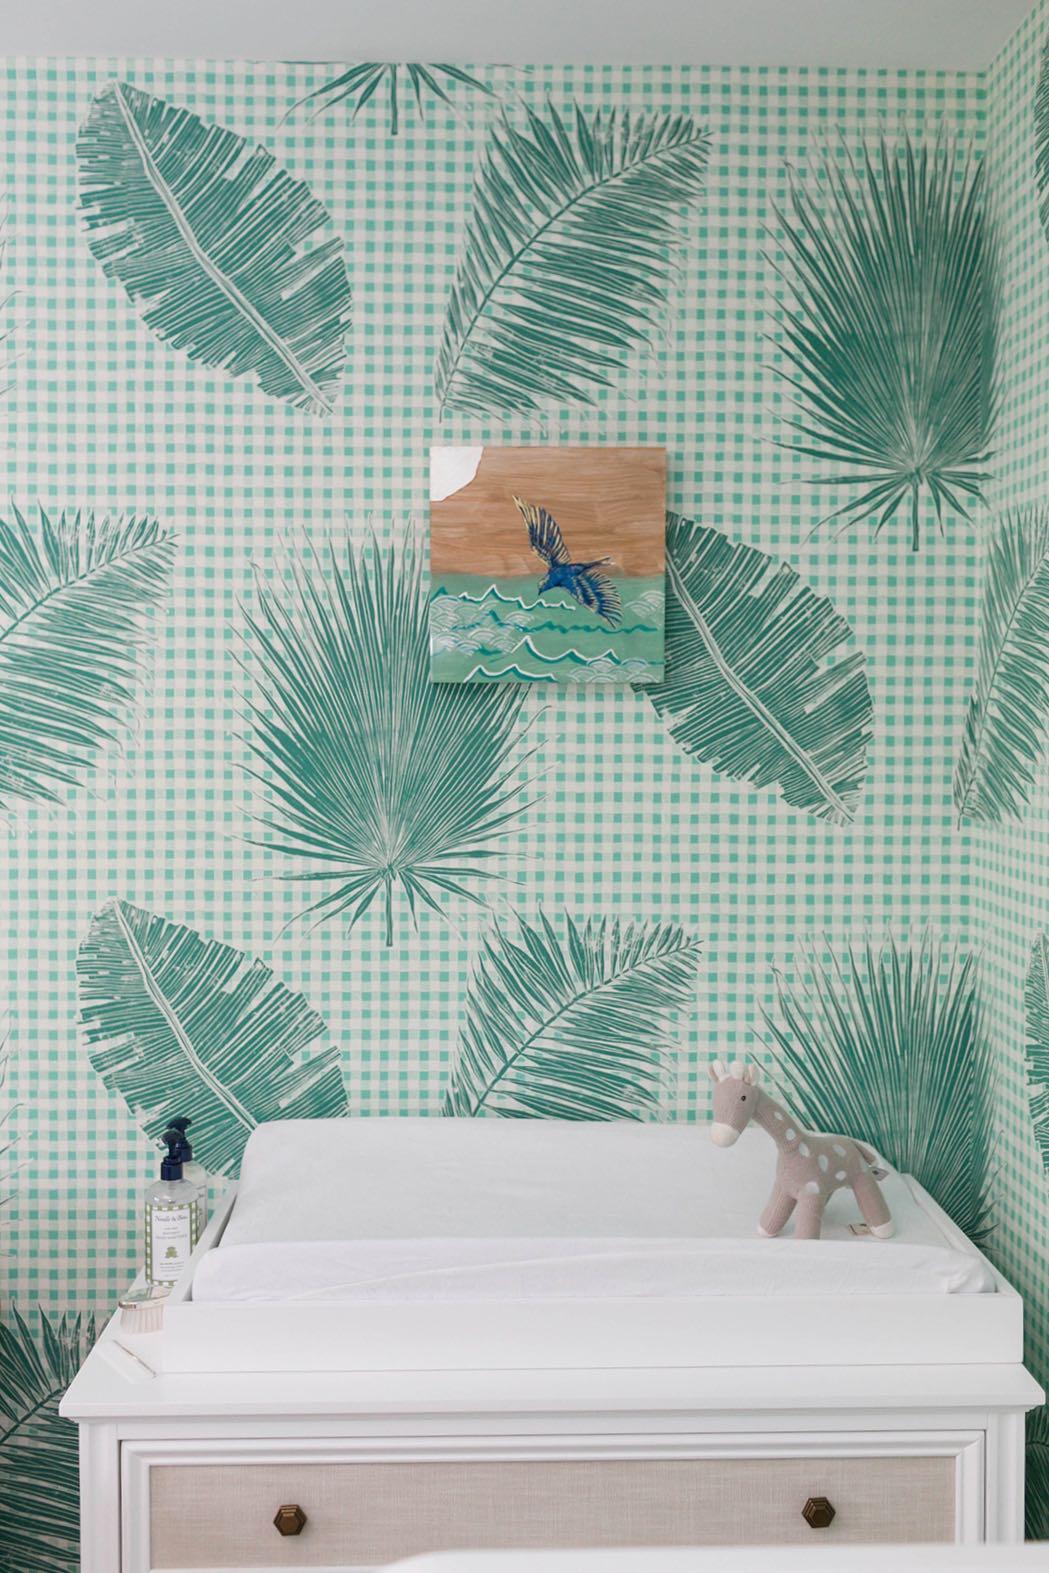 Gingham Jungle Wallpaper in Jade  Interiors by Sharon Lee; Photo by Mekina Saylor